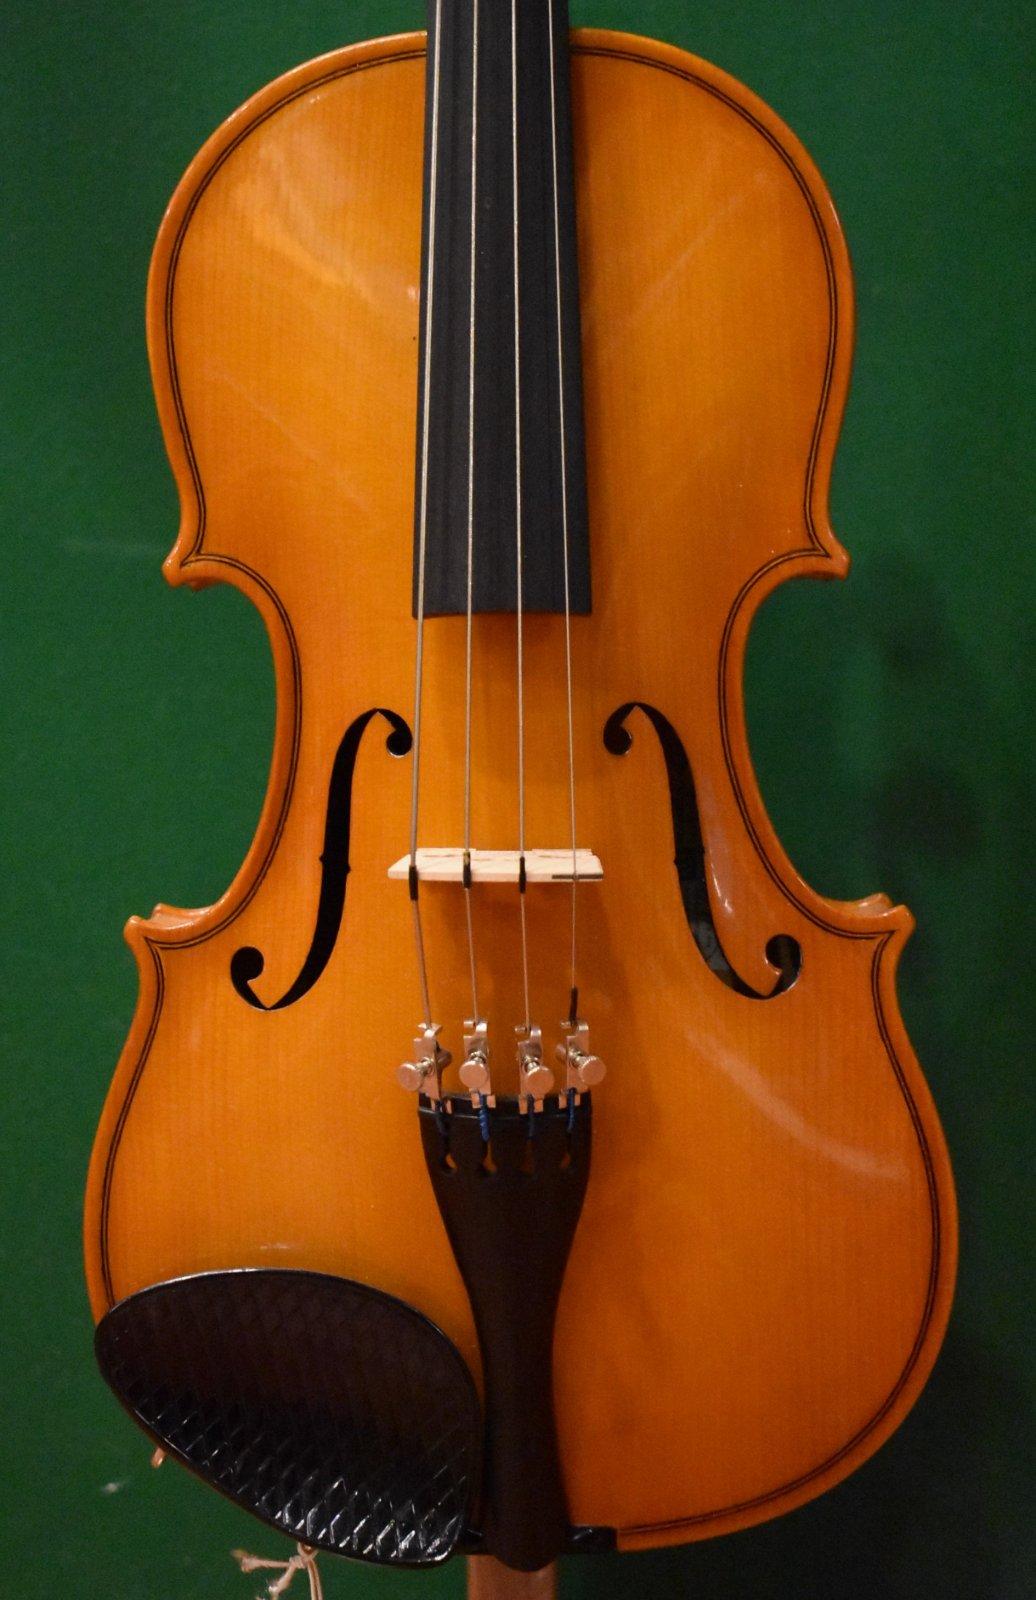 Glaesel VA27E13  13 Junior Viola Outfit